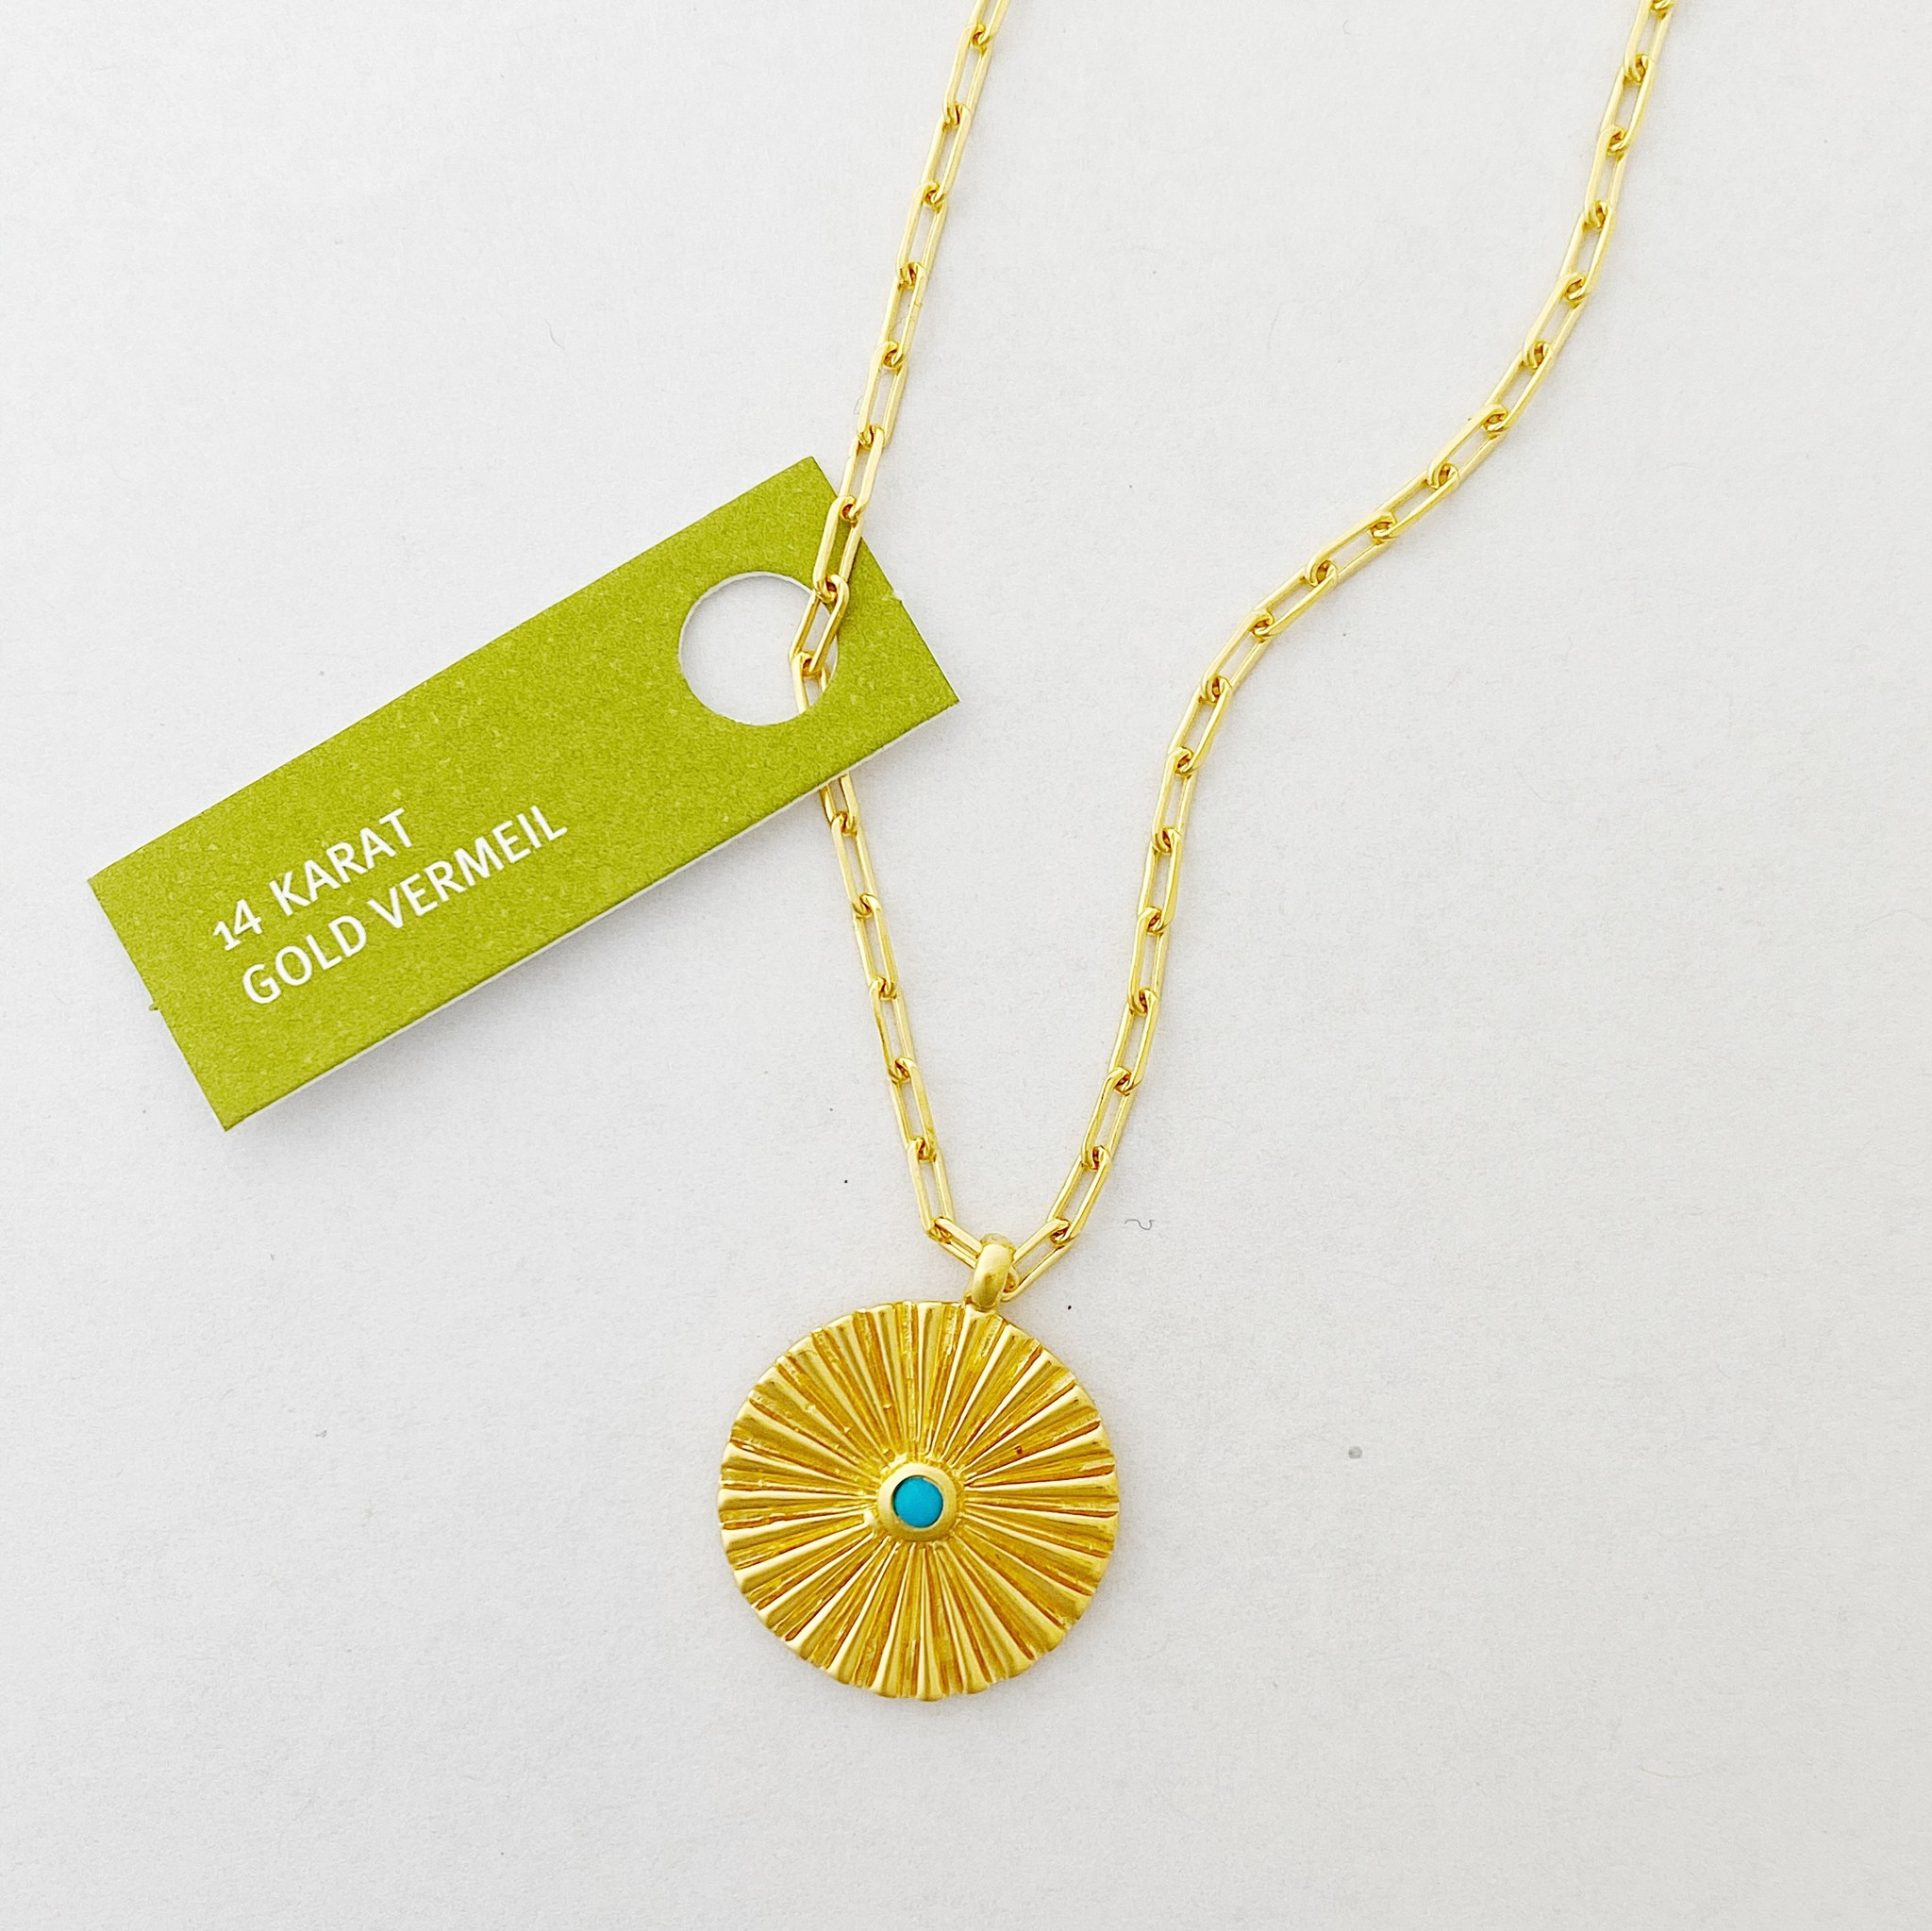 Tashi Gold Sunray Token Necklace w Turquoise